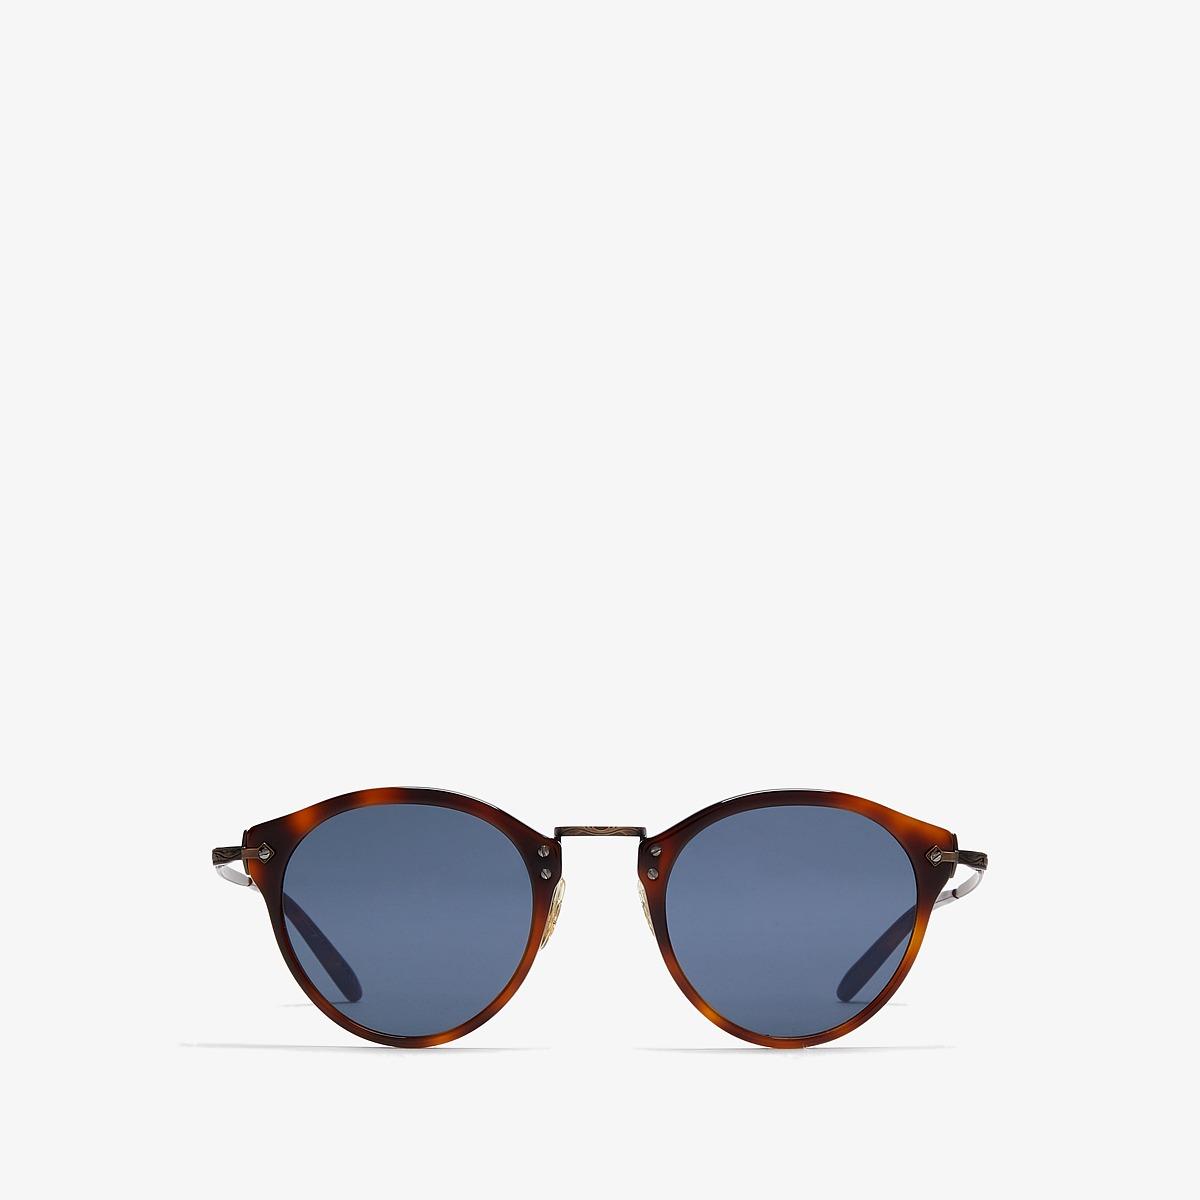 Oliver Peoples - OP-505 Sun (Dark Mahogany/Bronze/Blue) Fashion Sunglasses